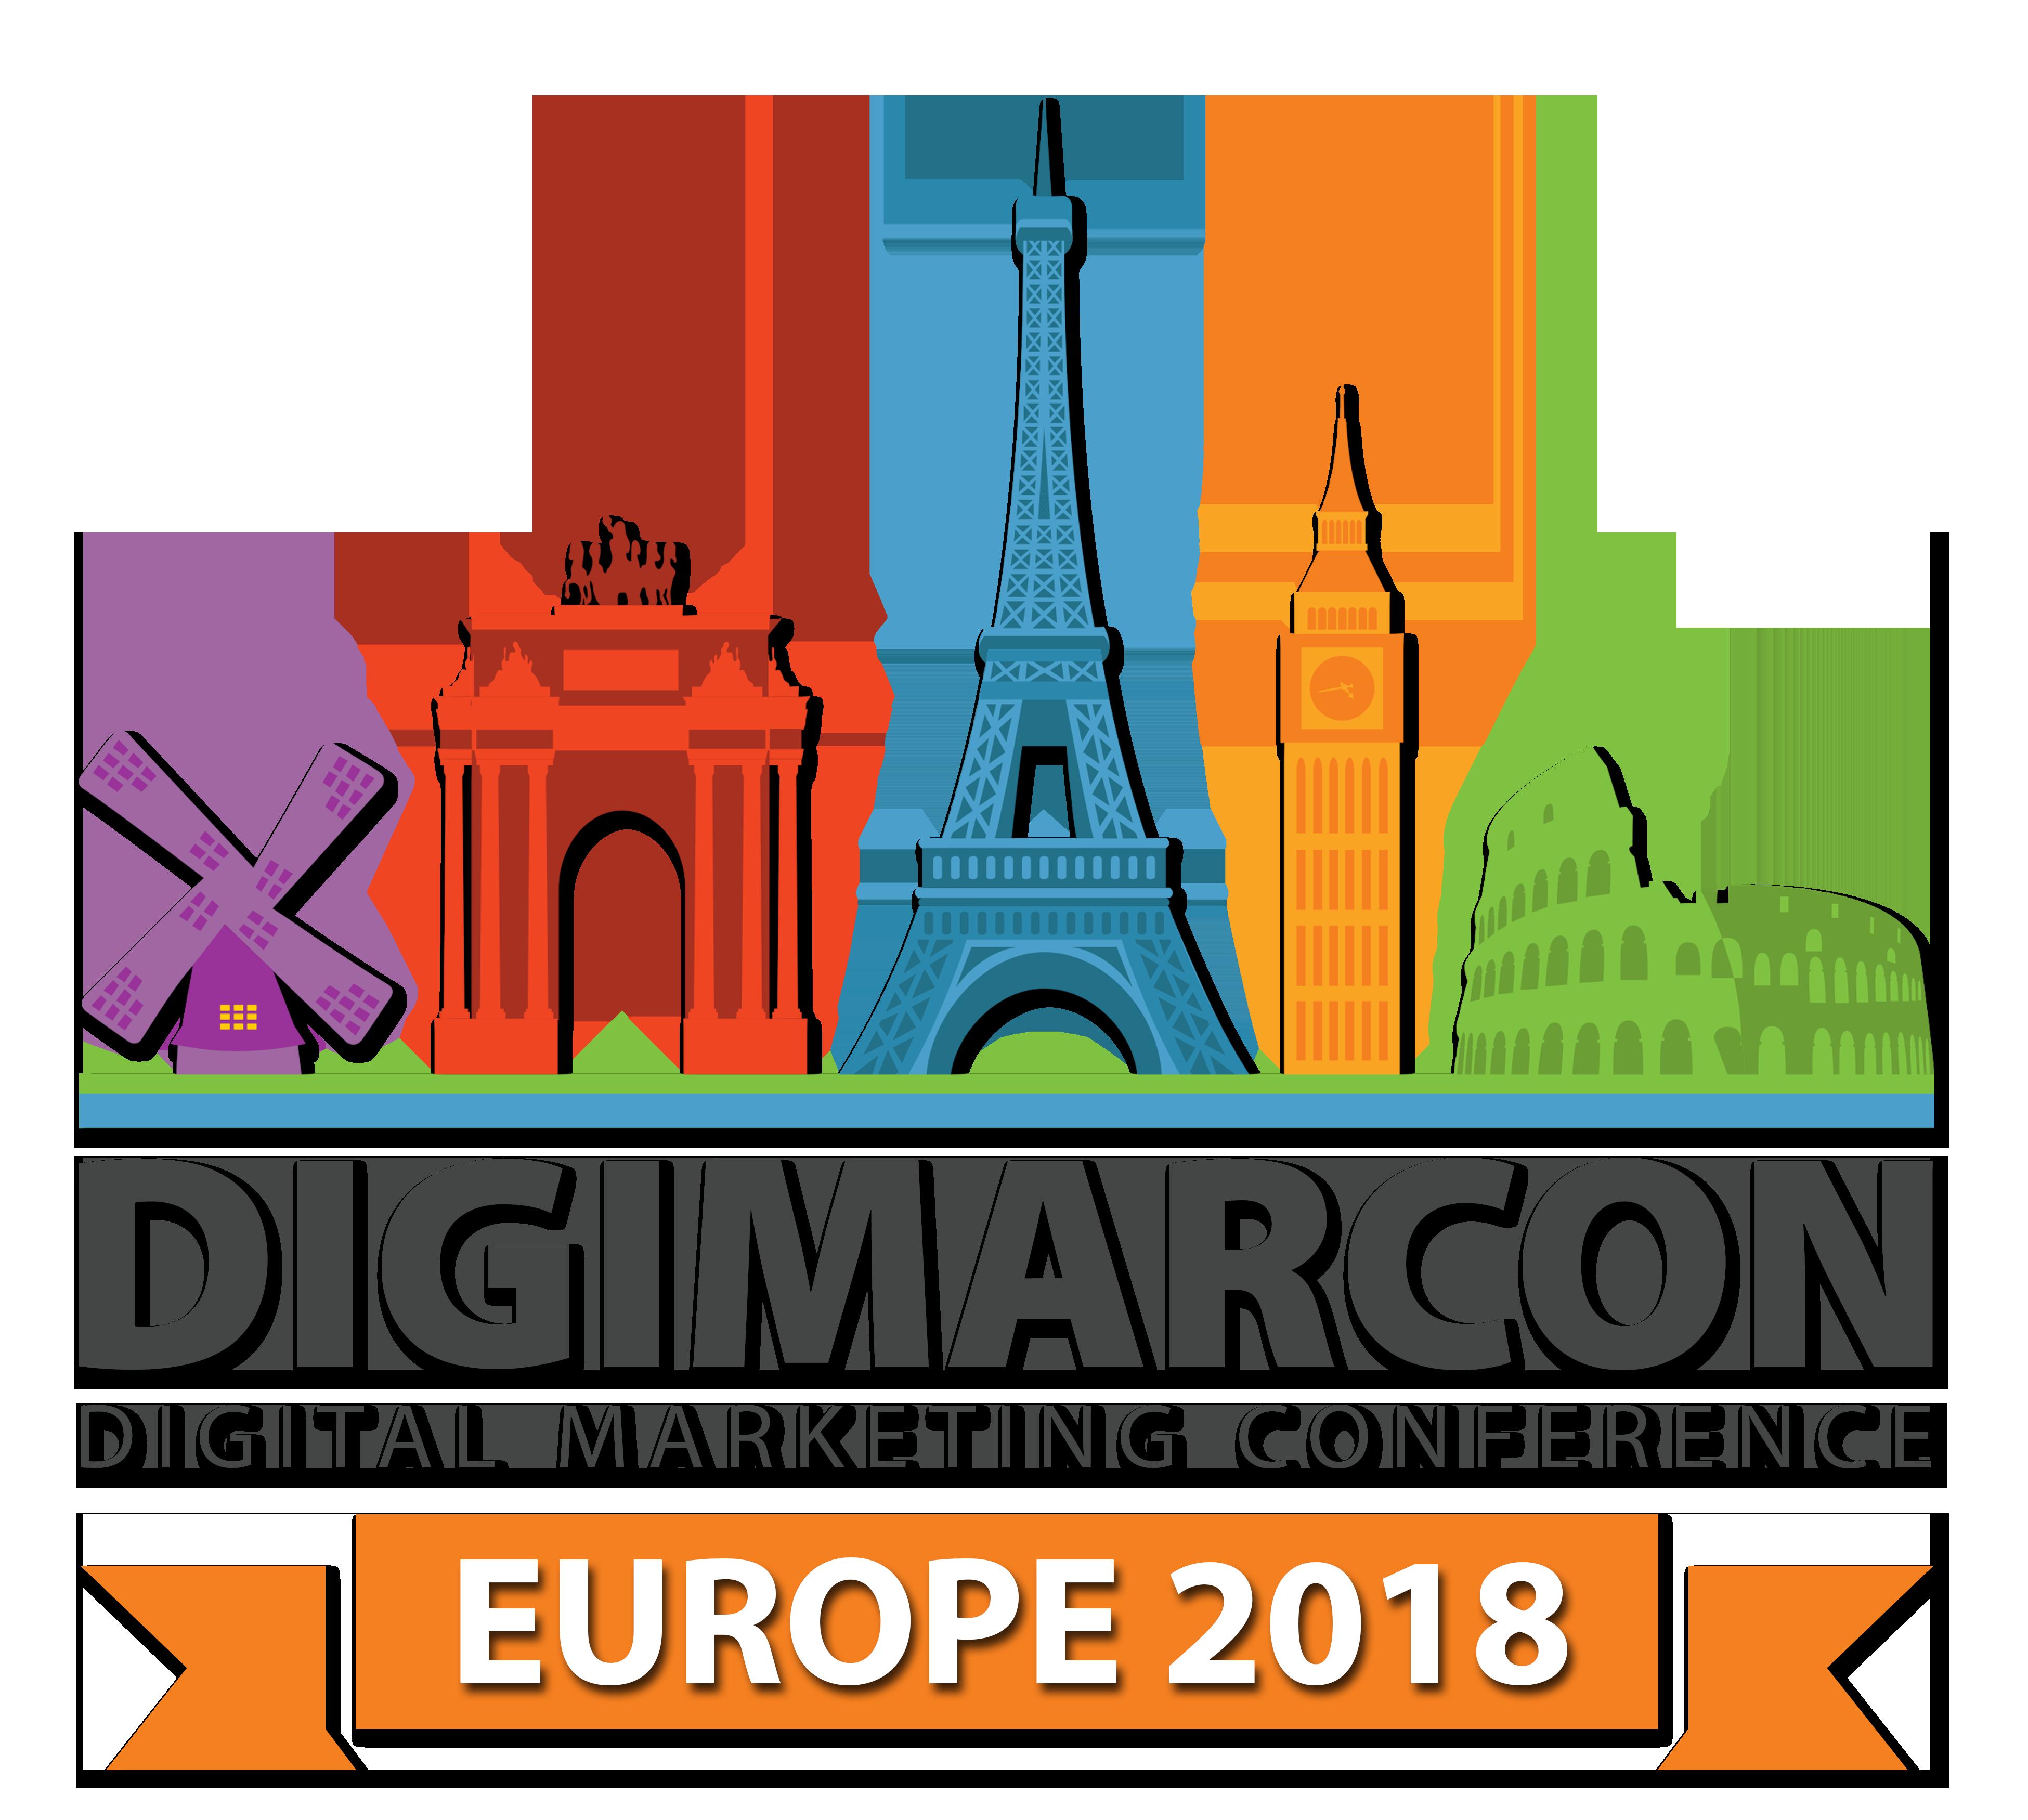 Conference clipart guest speaker. Digimarcon europe digital marketing